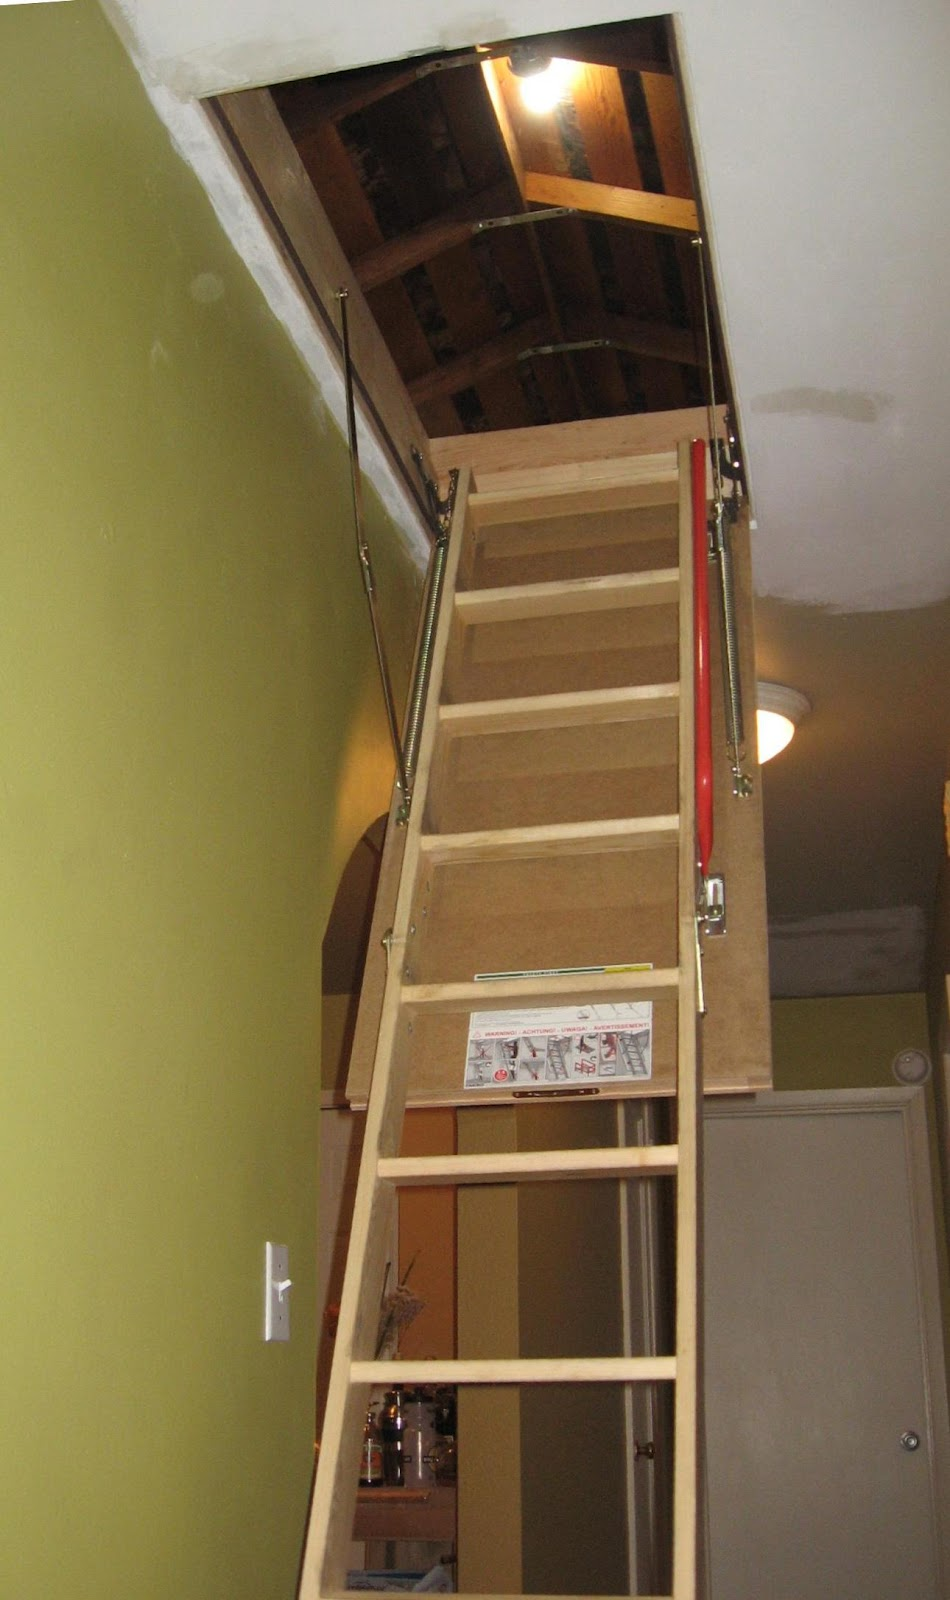 Phillip Norman Attic Access Attic Ladder Installation